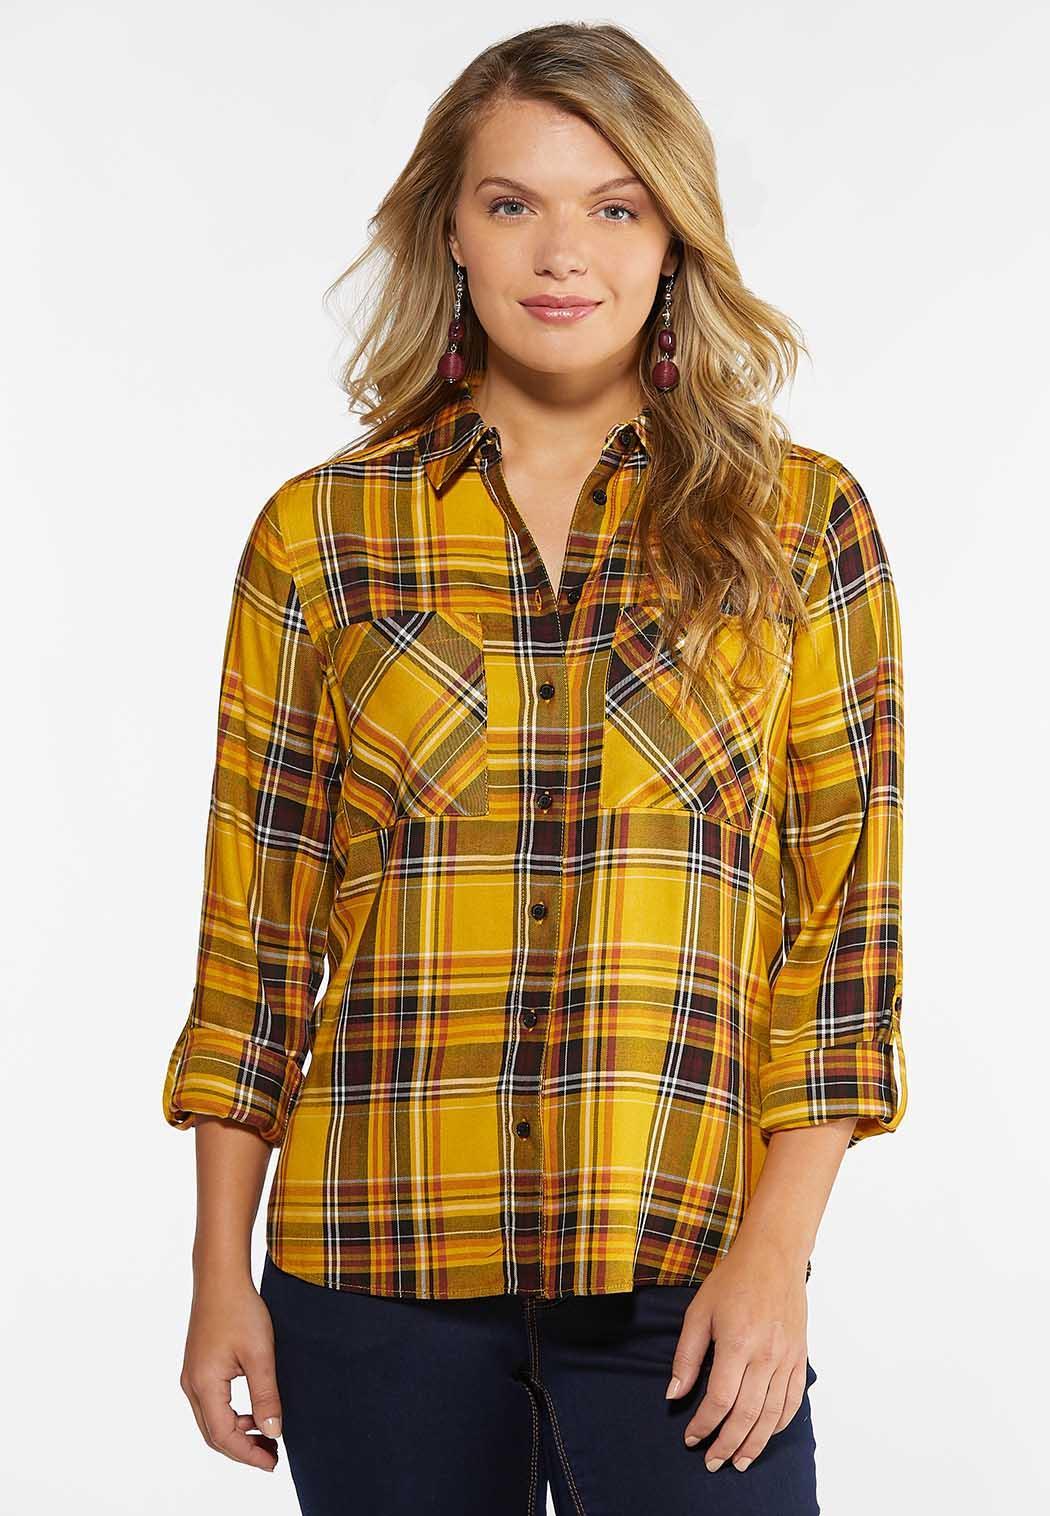 Gold Plaid Shirt